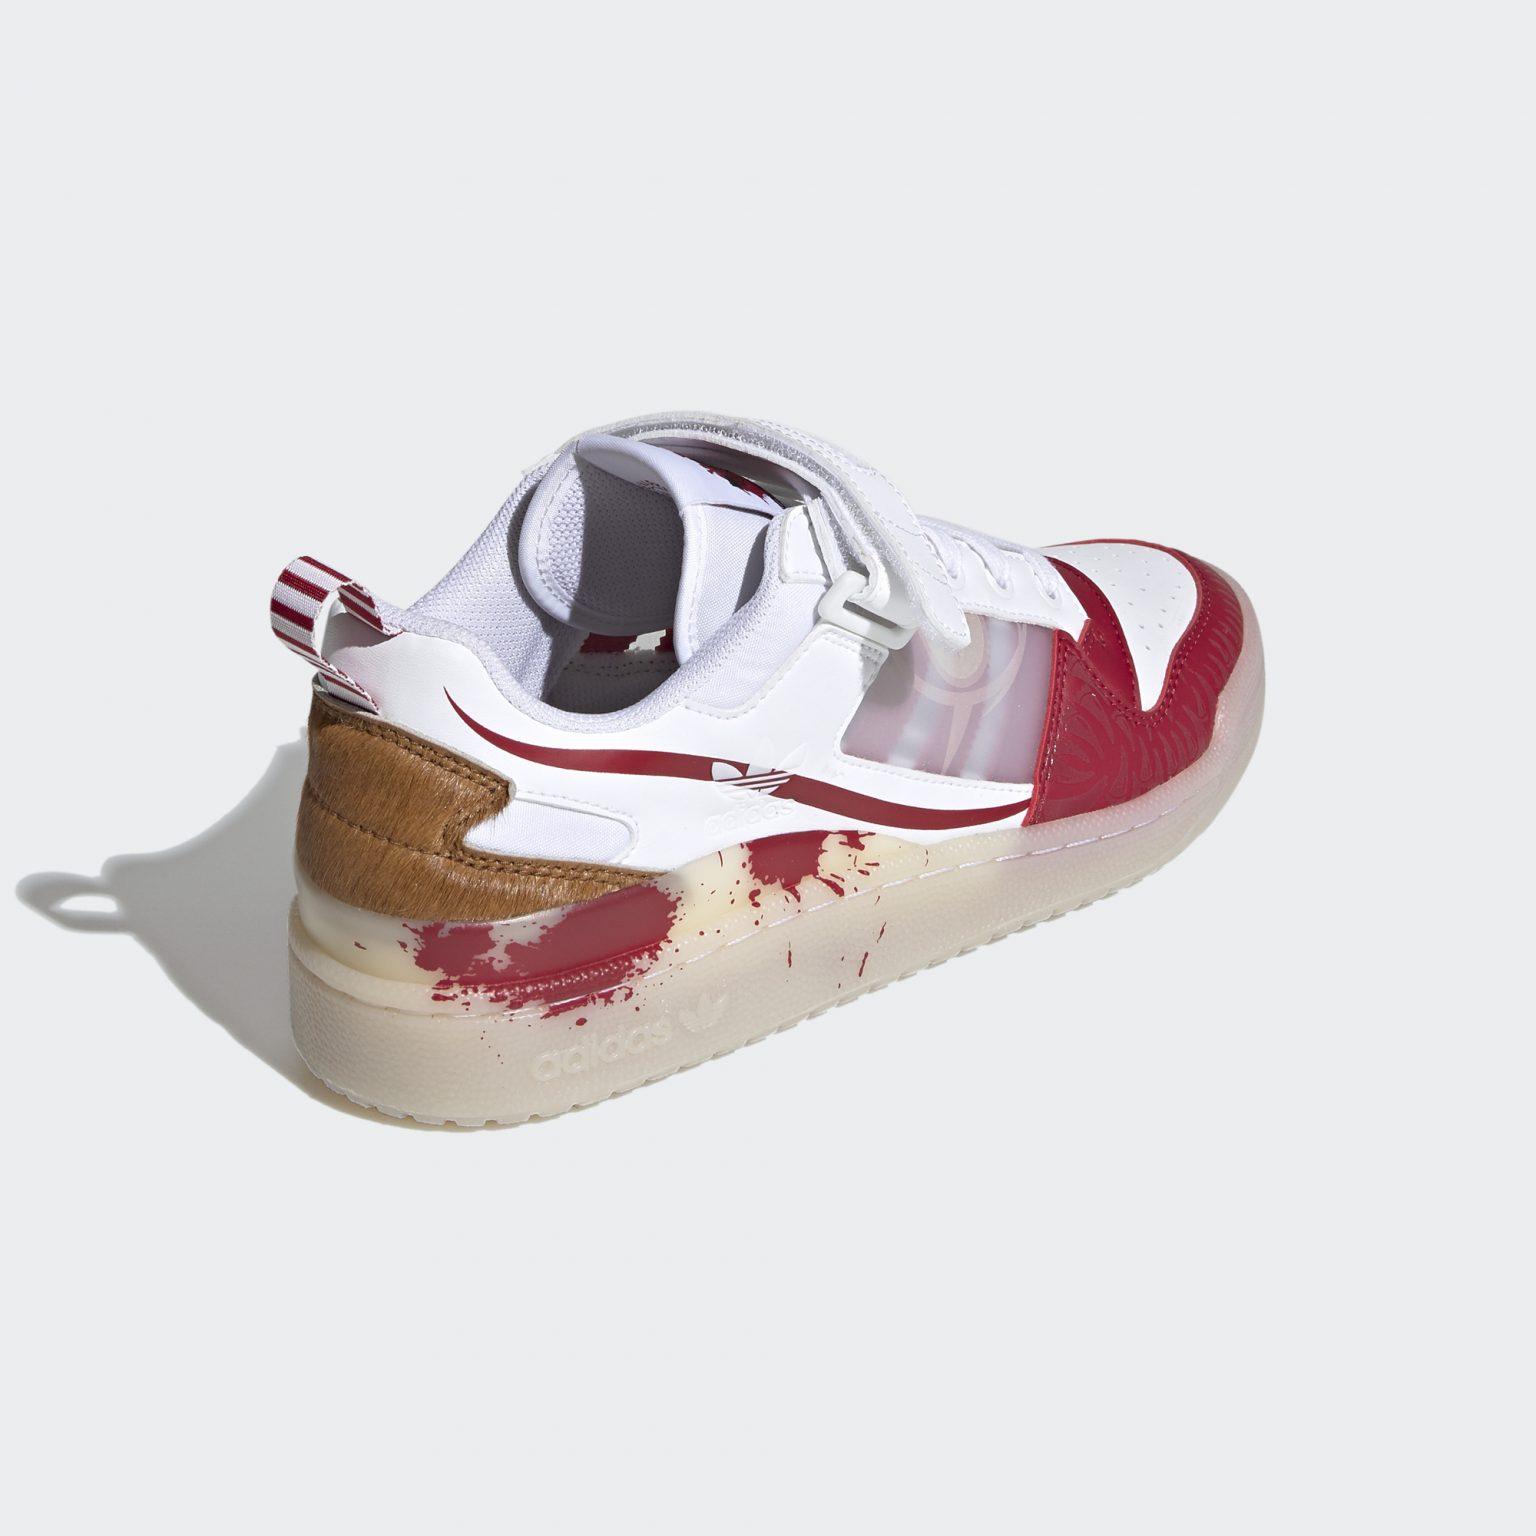 giay the thao hot tu 25-31.10.2020 adidas-halloween-elleman (4)